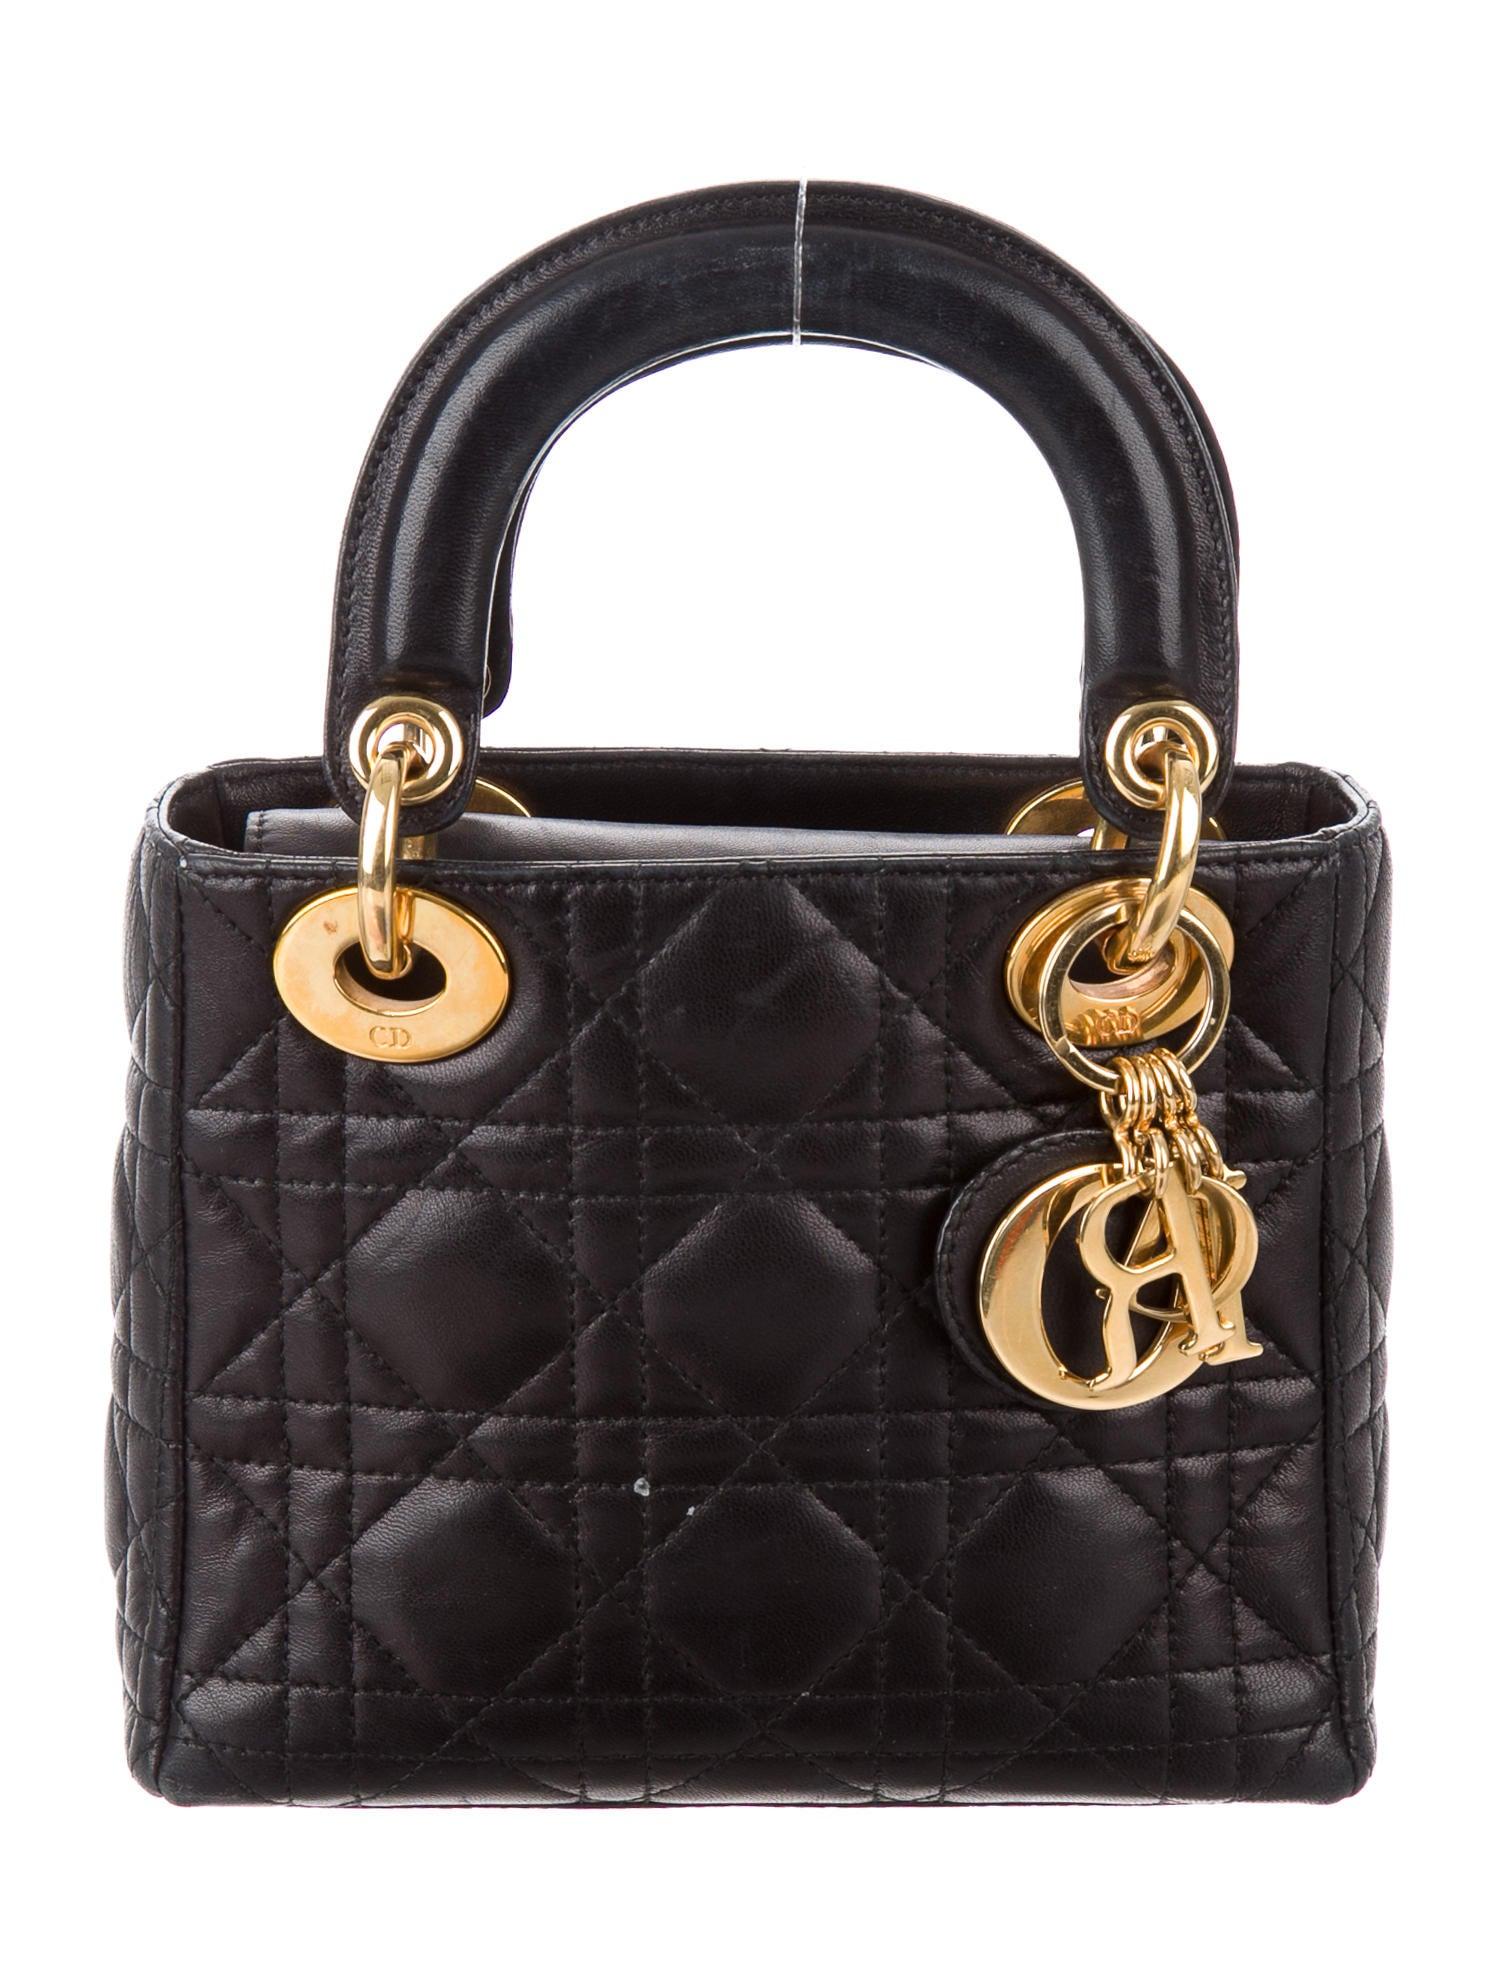 christian dior mini lady dior bag handbags chr59113 the realreal. Black Bedroom Furniture Sets. Home Design Ideas